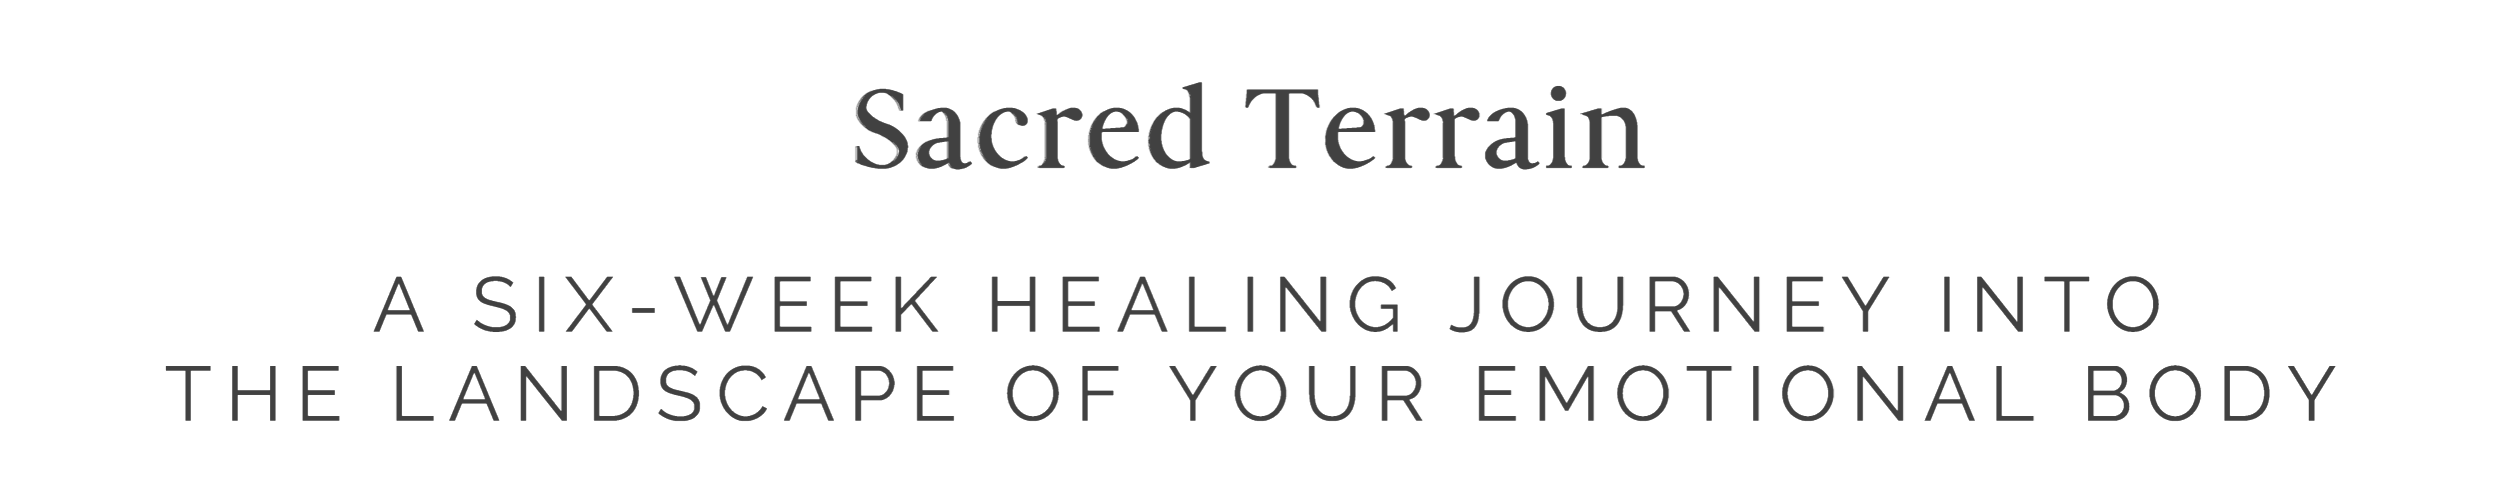 Sacred-Terrain-Title-no-logo-large.png